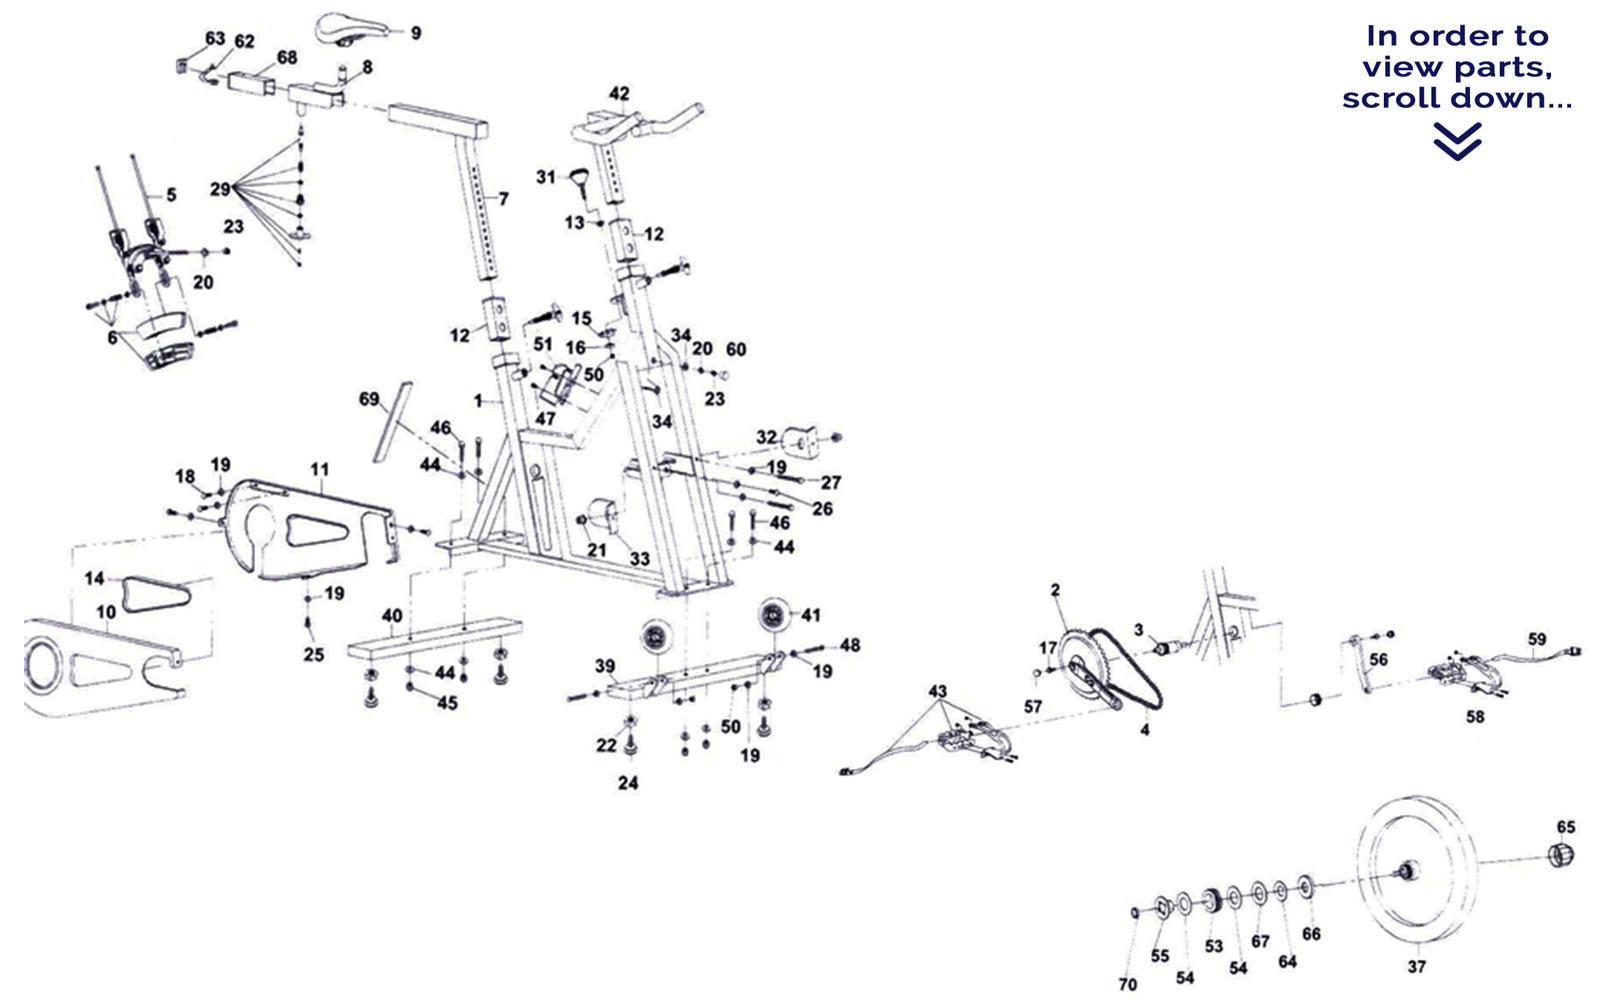 Schwinn Bicycle Parts Breakdown : Schwinn bike parts diagram bicycling and the best ideas